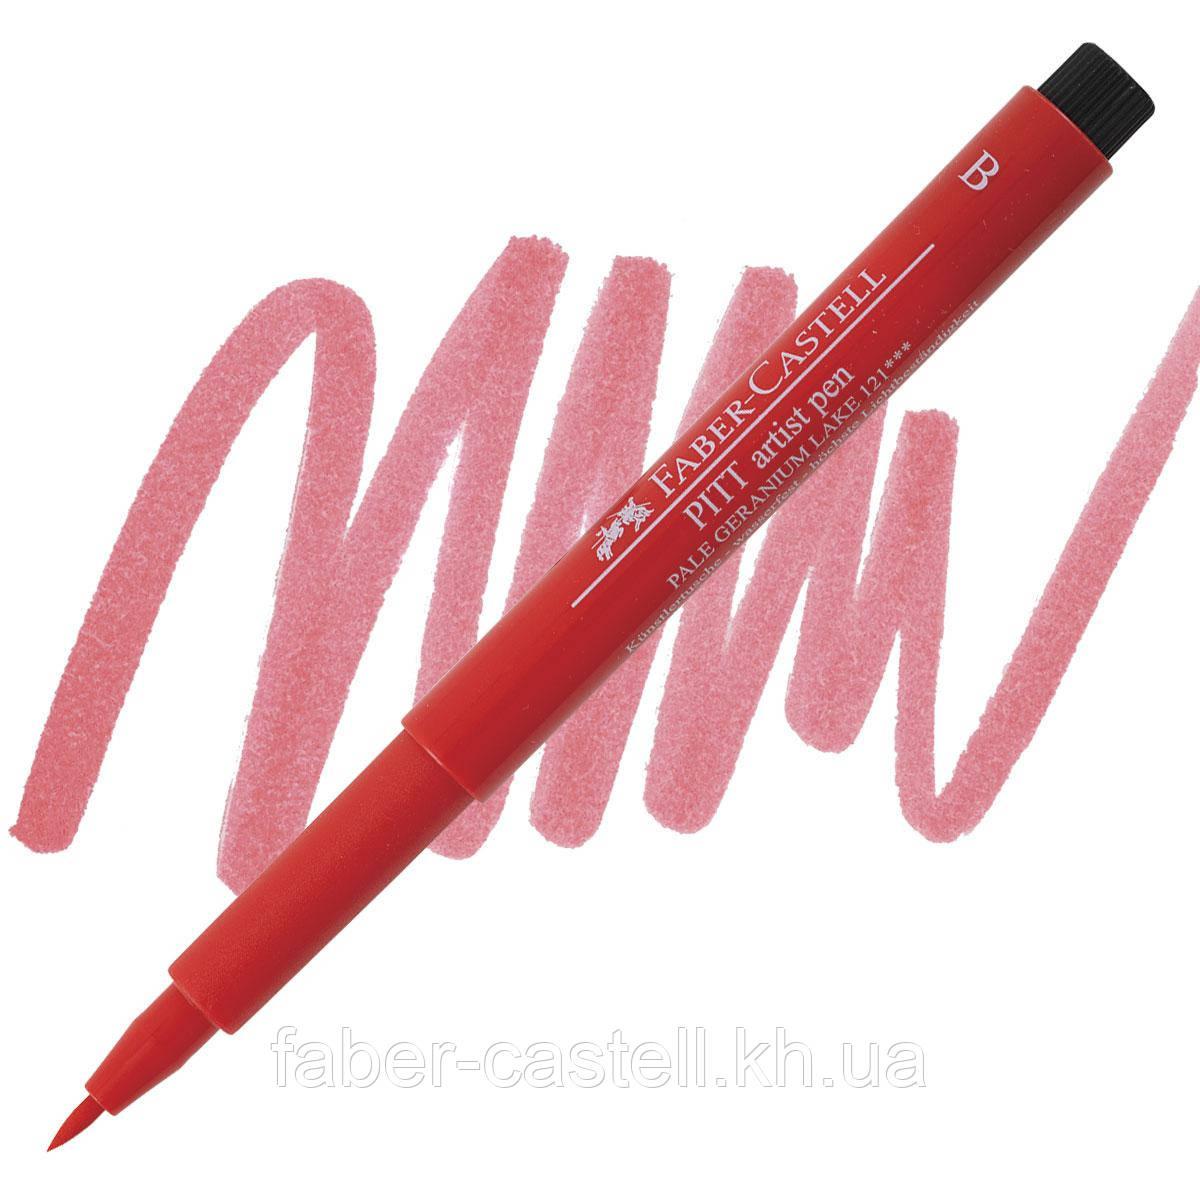 "Ручка-кисточка капиллярная Faber - Castell PITT® ARTIST PEN ""BRUSH"" №121 бледно-розовая герань, 167421"